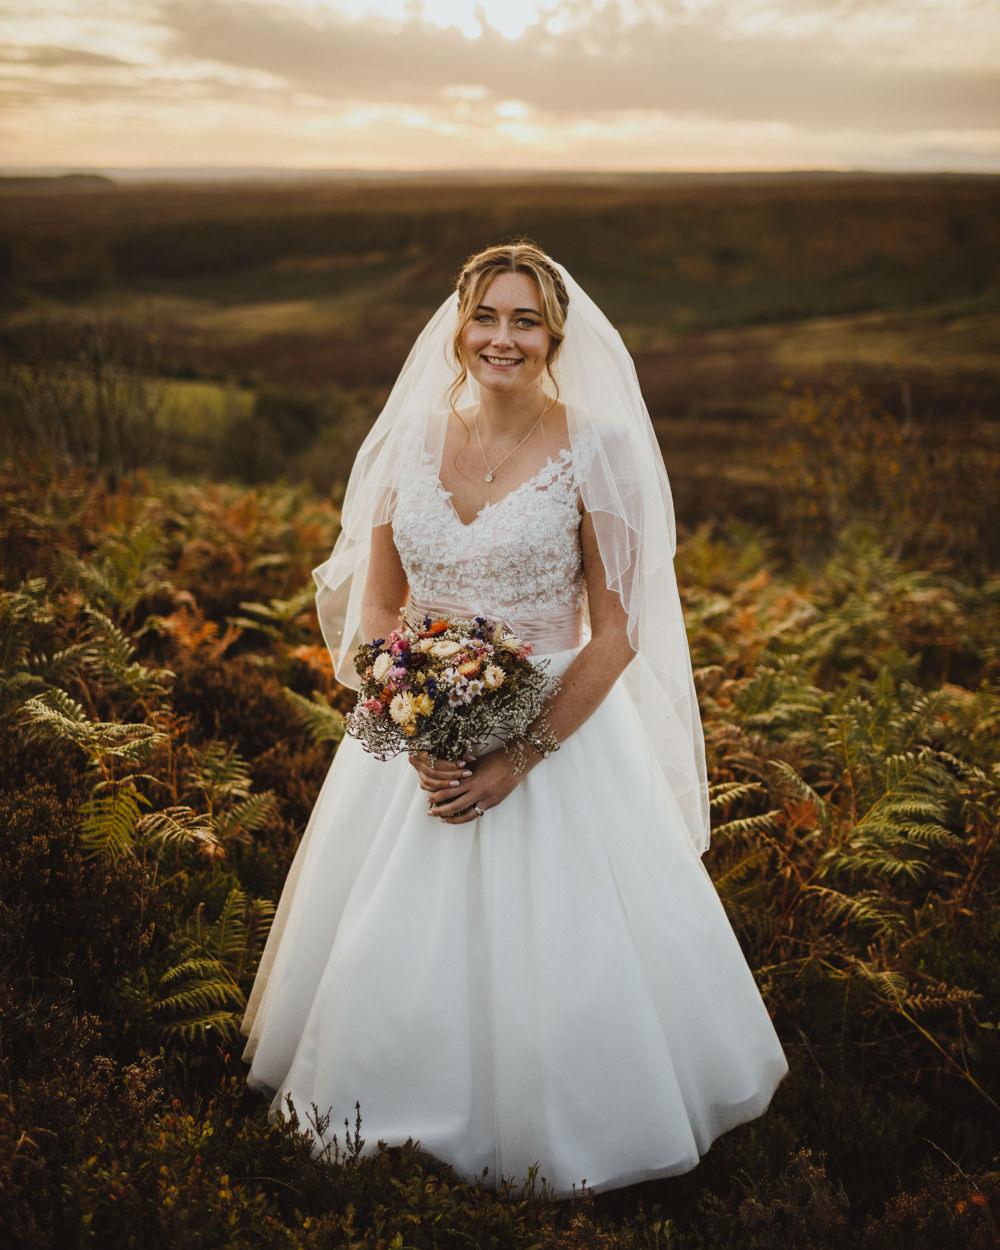 Dress Gown Bride Bridal Lace Tea Length Short Train Station Harry Potter Wedding Photography34